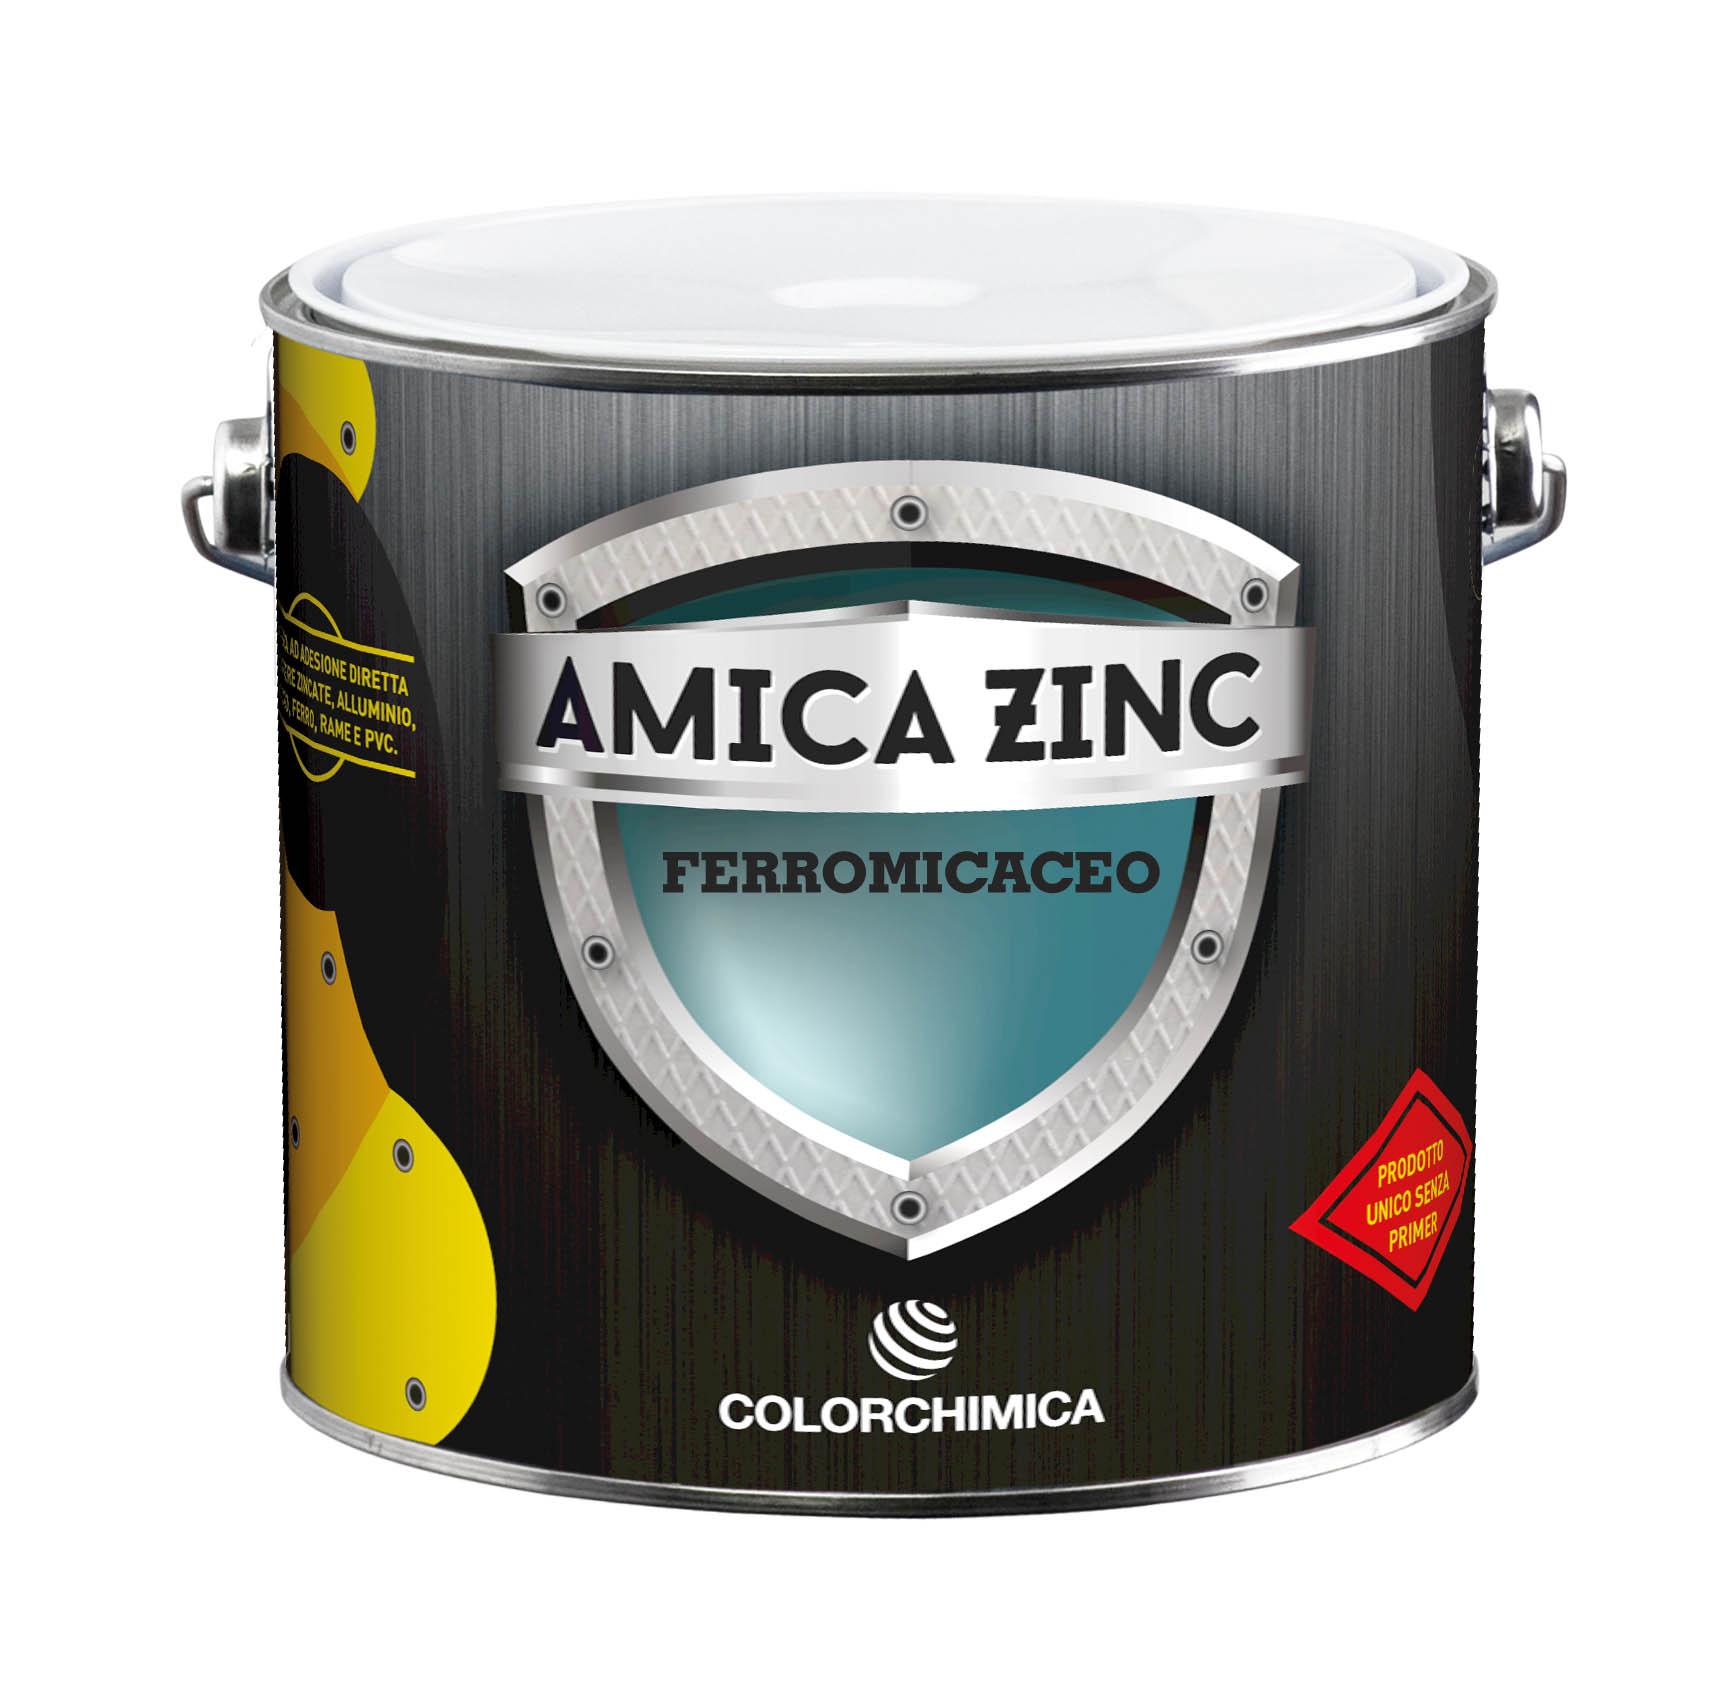 AMICA ZINC - Ferromicaceo Zinco Aderente serie 4300 grana grossa / 4310 grana fine